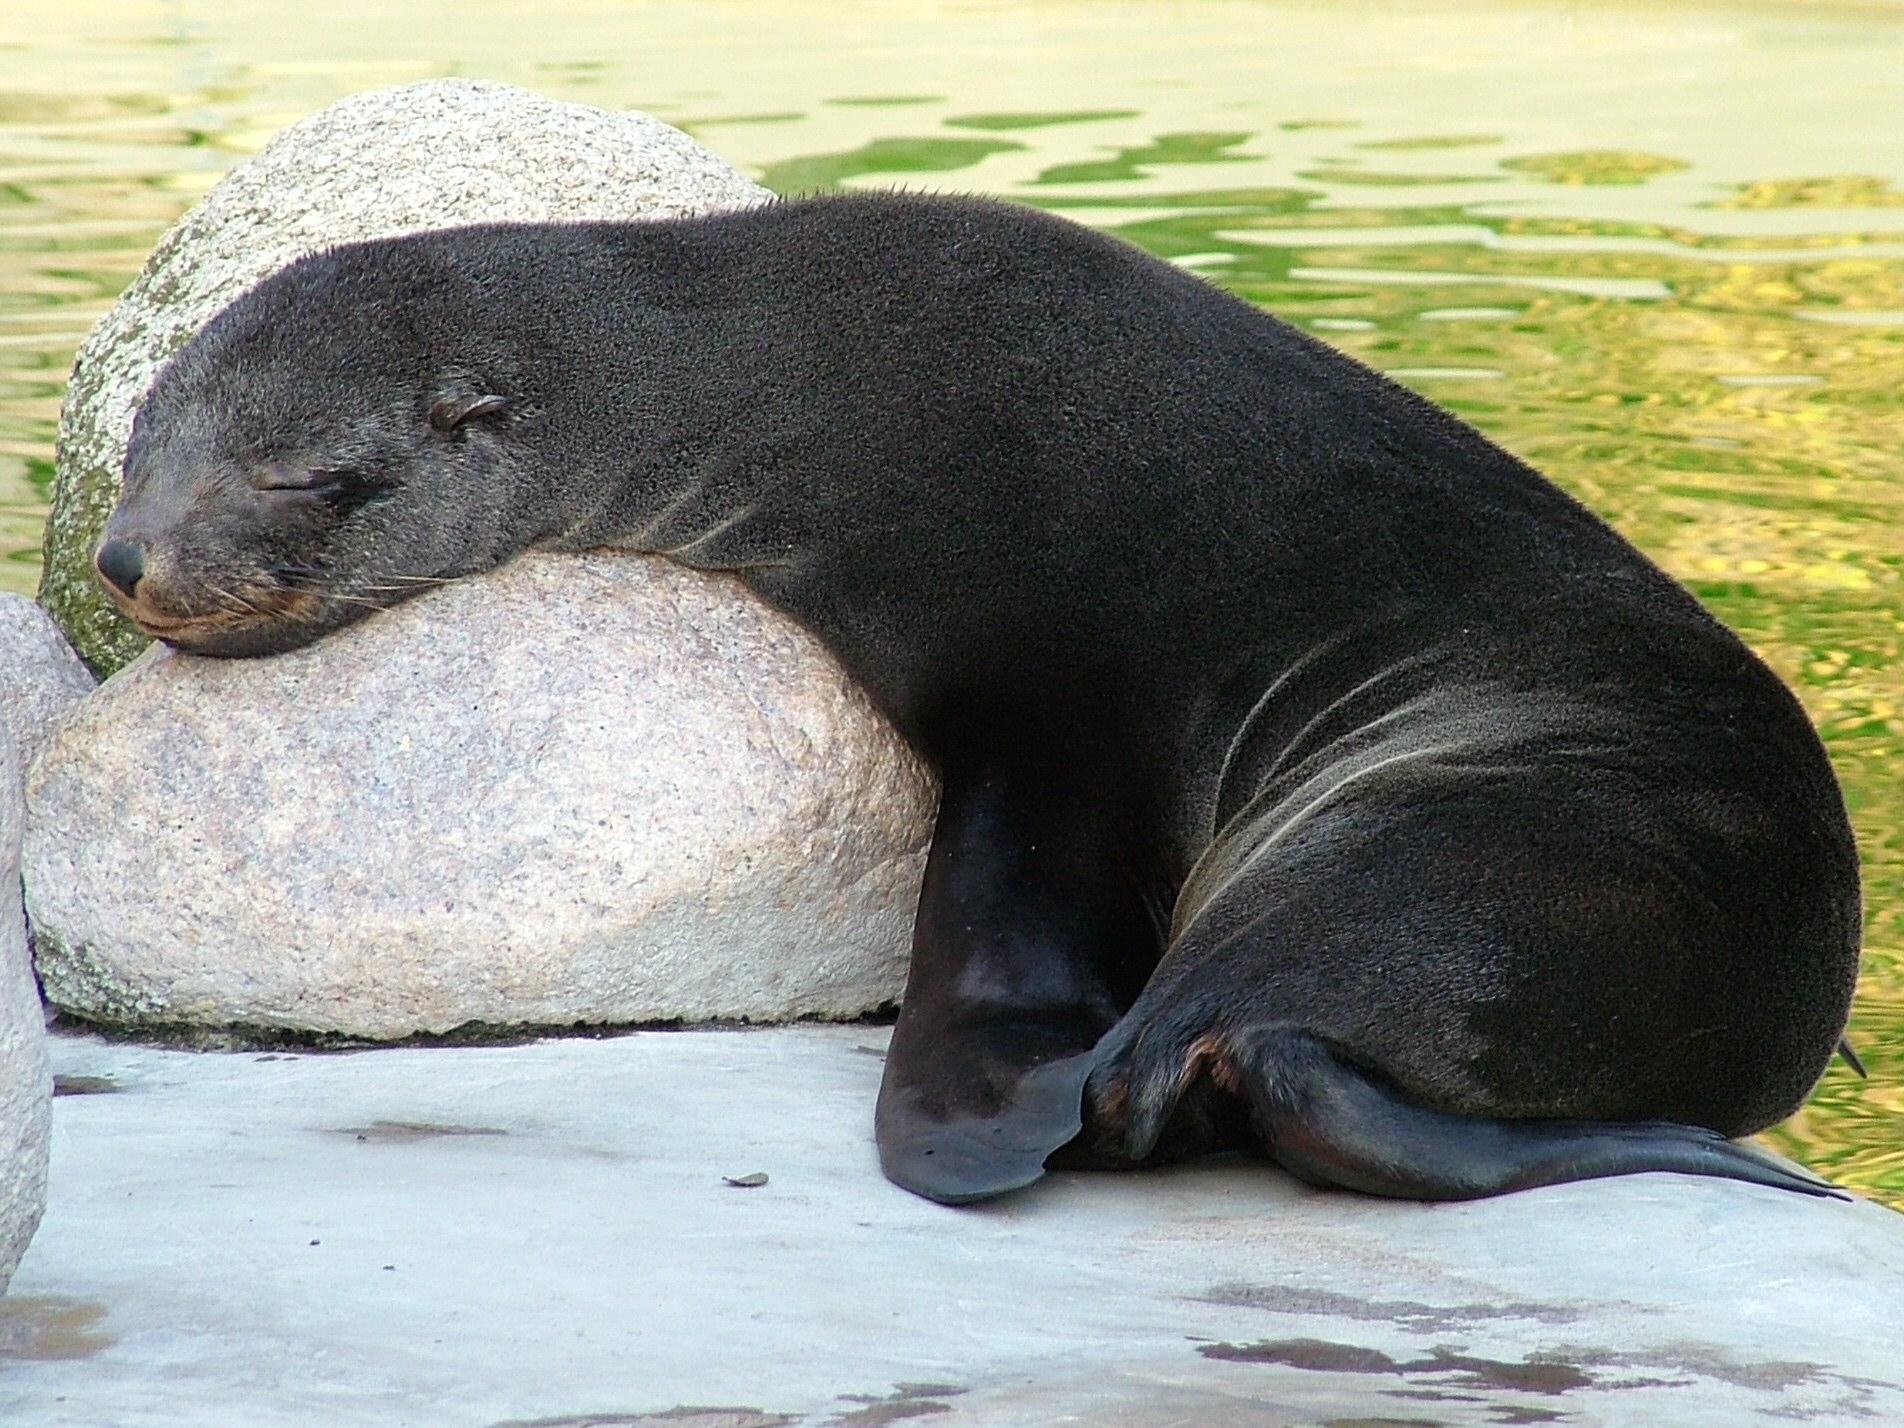 Sleeping with one eye open: fur seals may help us understand sleep patterns